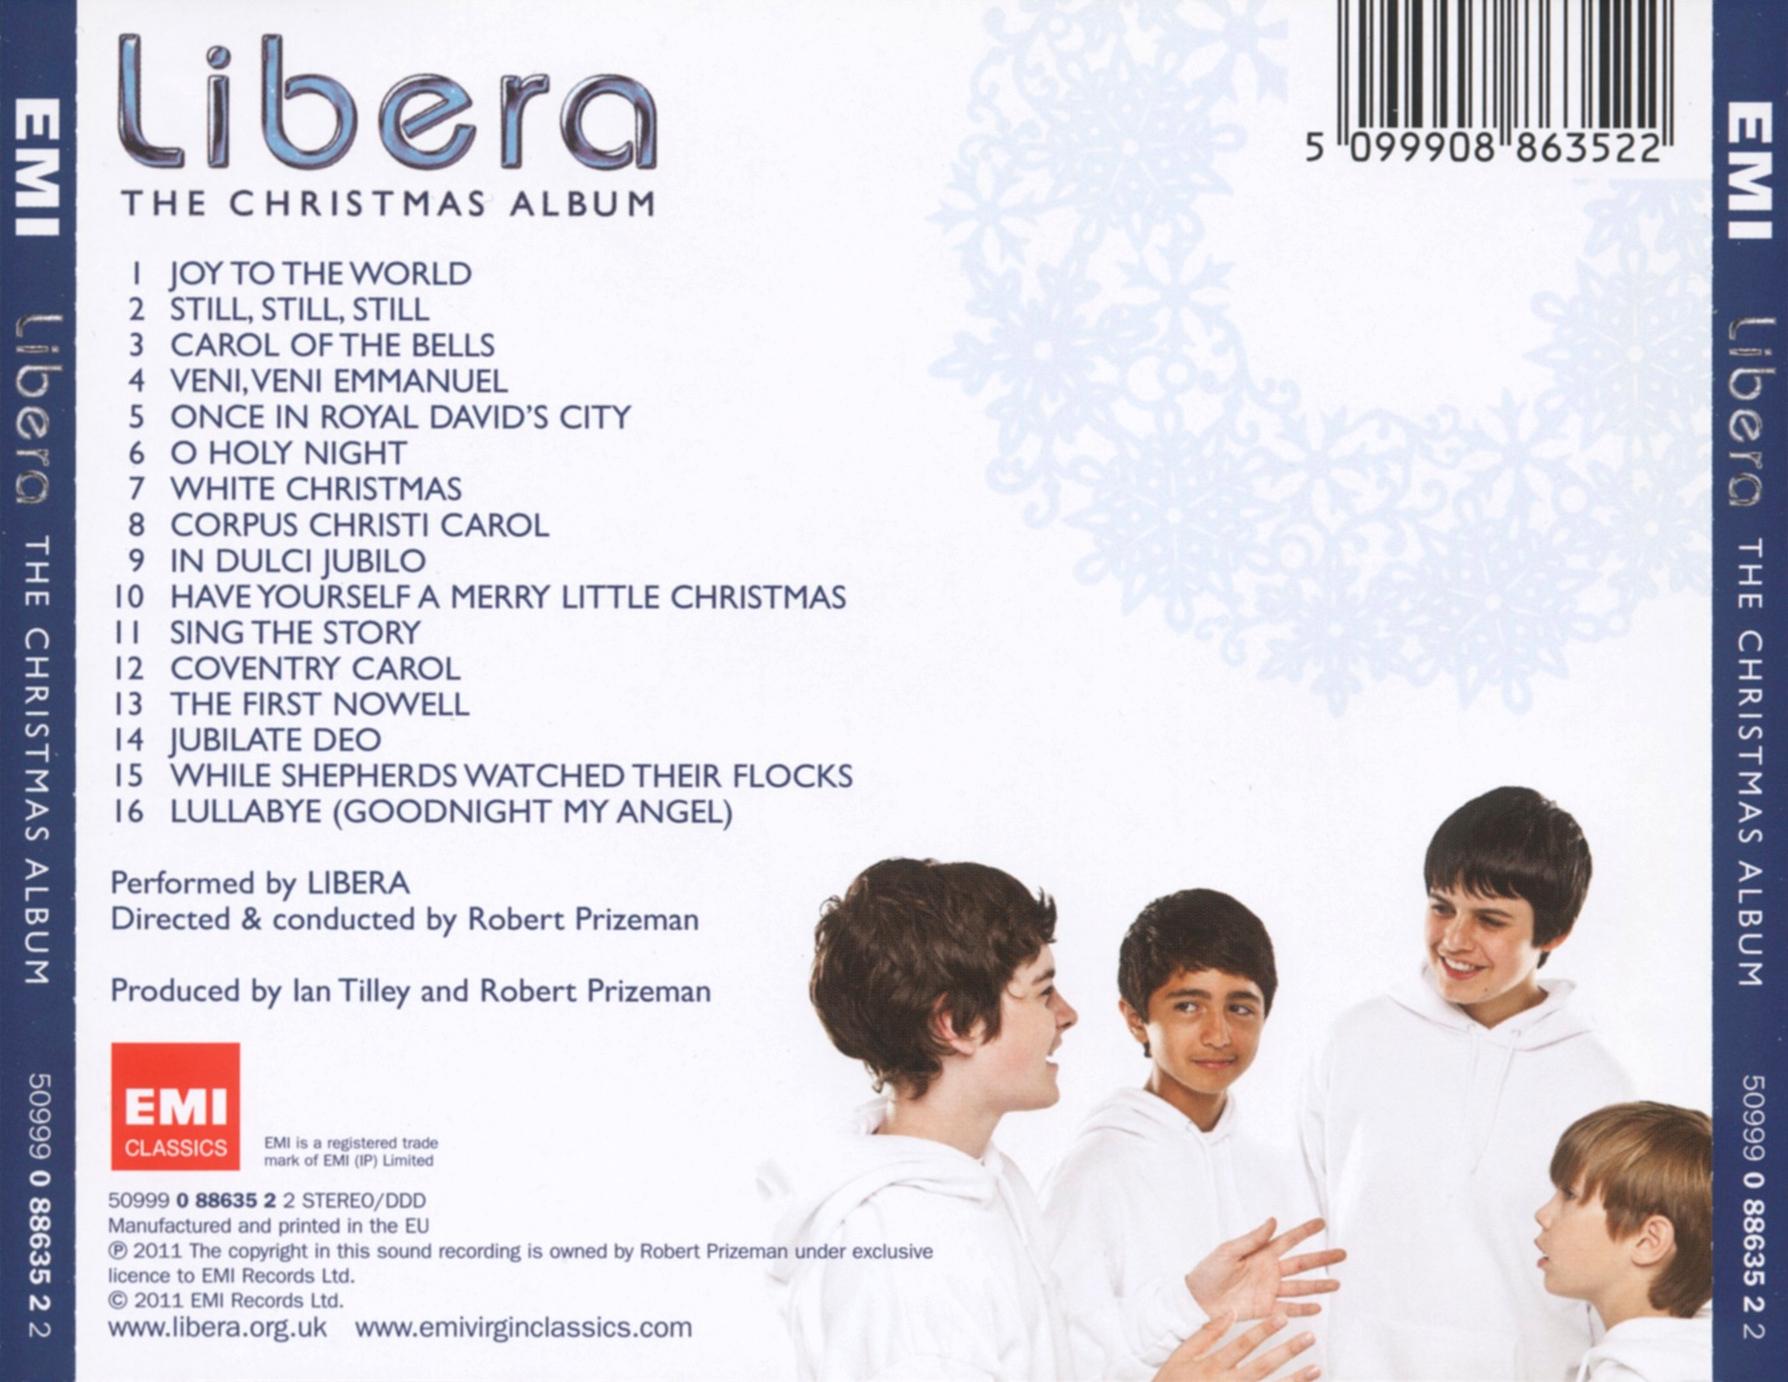 La discographie Libera 390031Doslarge